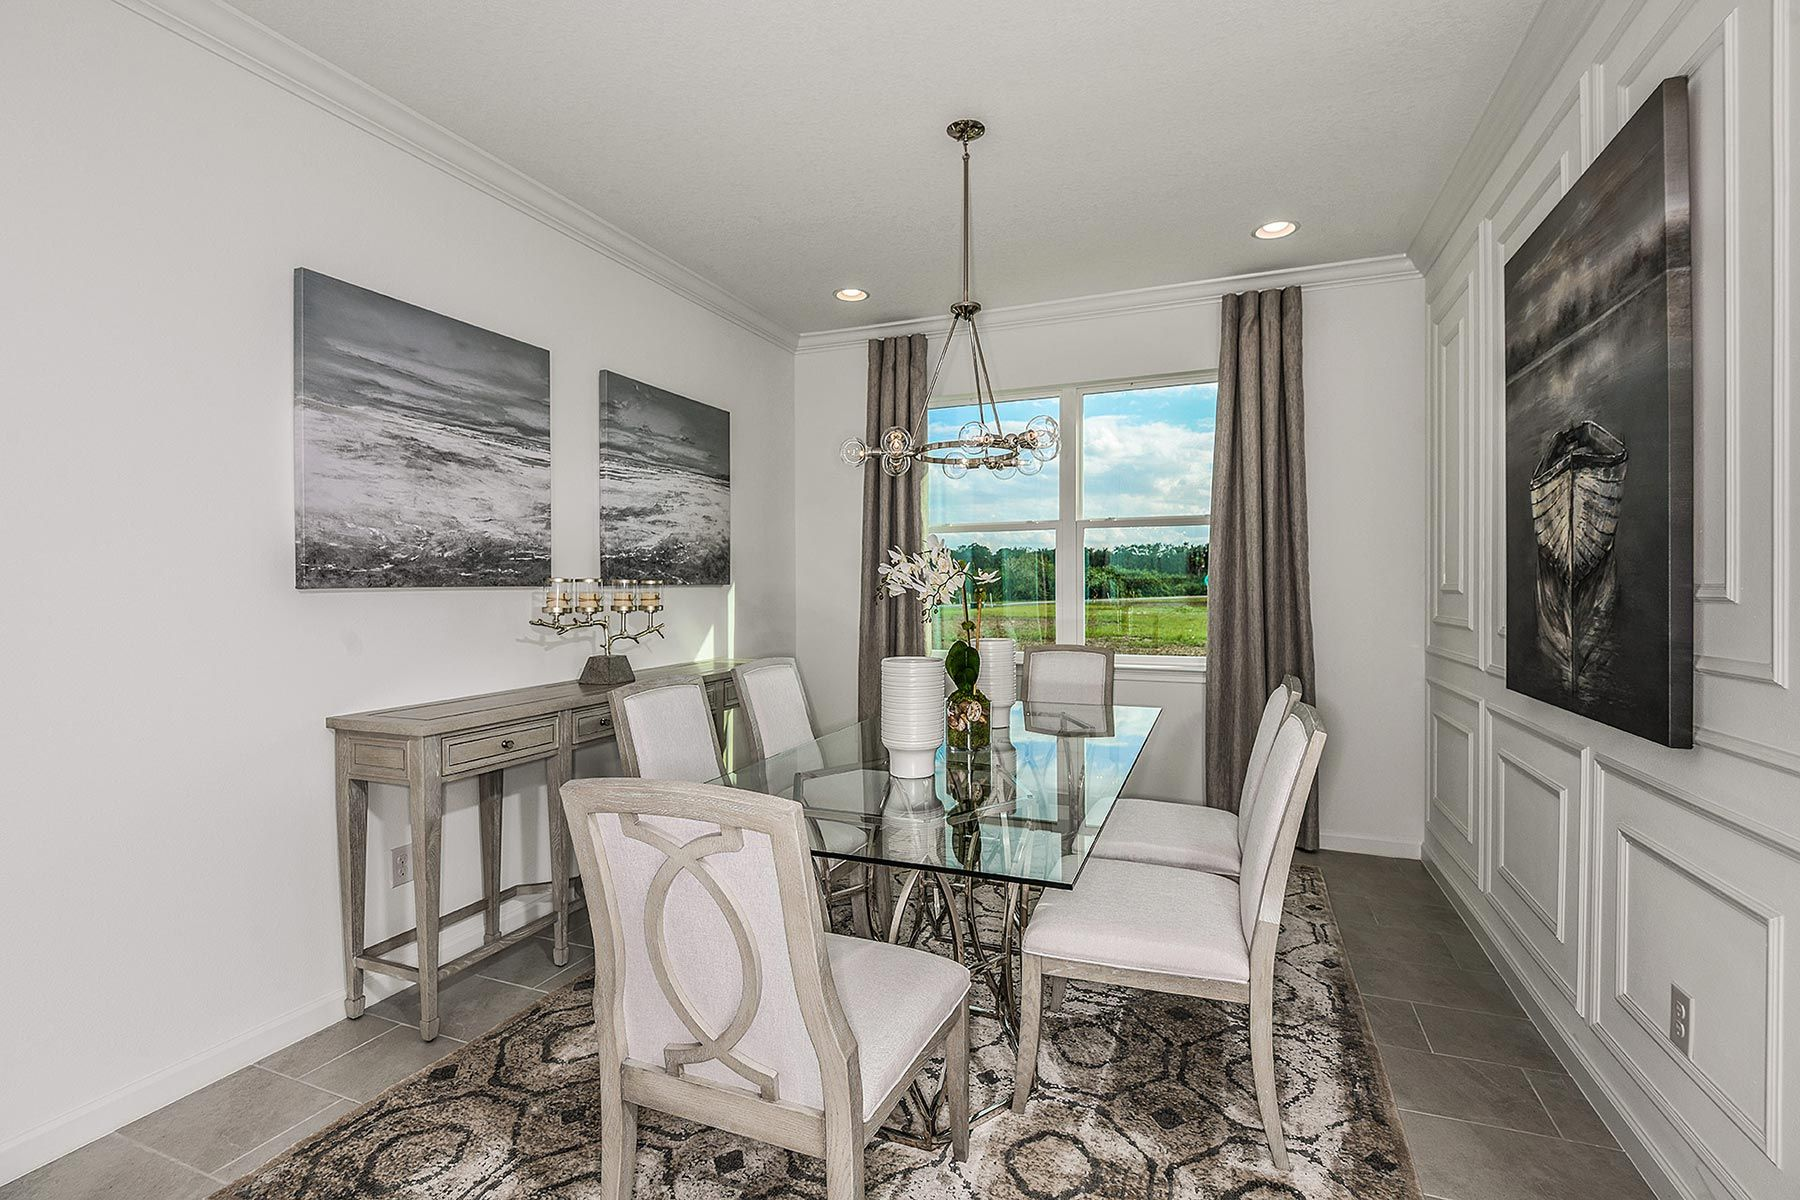 Kitchen featured in the Seascape By Mattamy Homes in Sarasota-Bradenton, FL